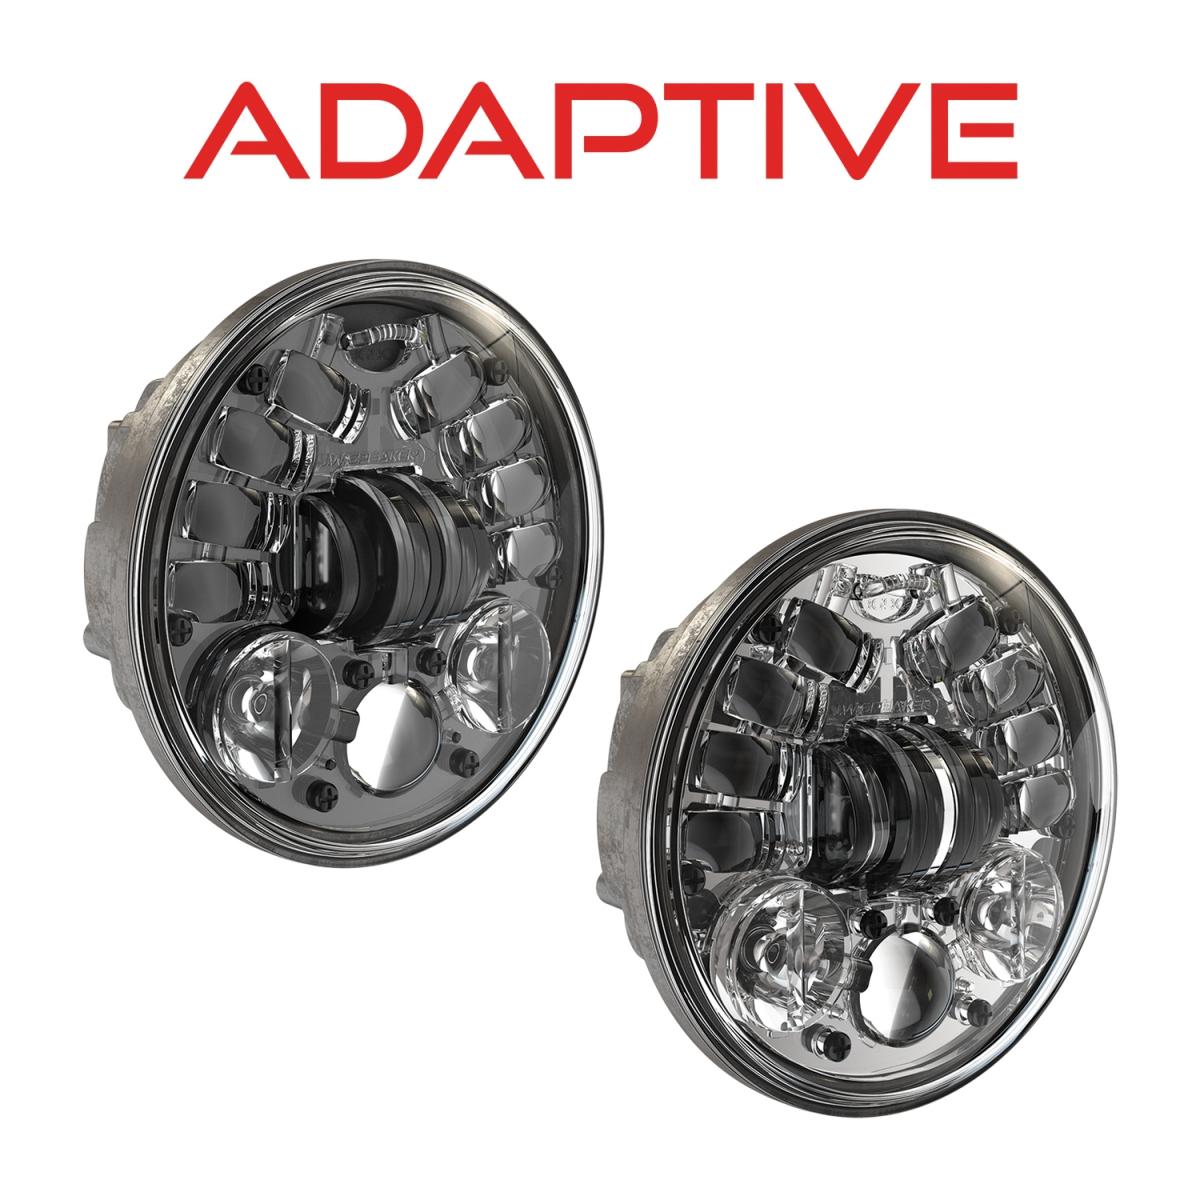 Motorcycle LED Headlights – Model 8690 Adaptive